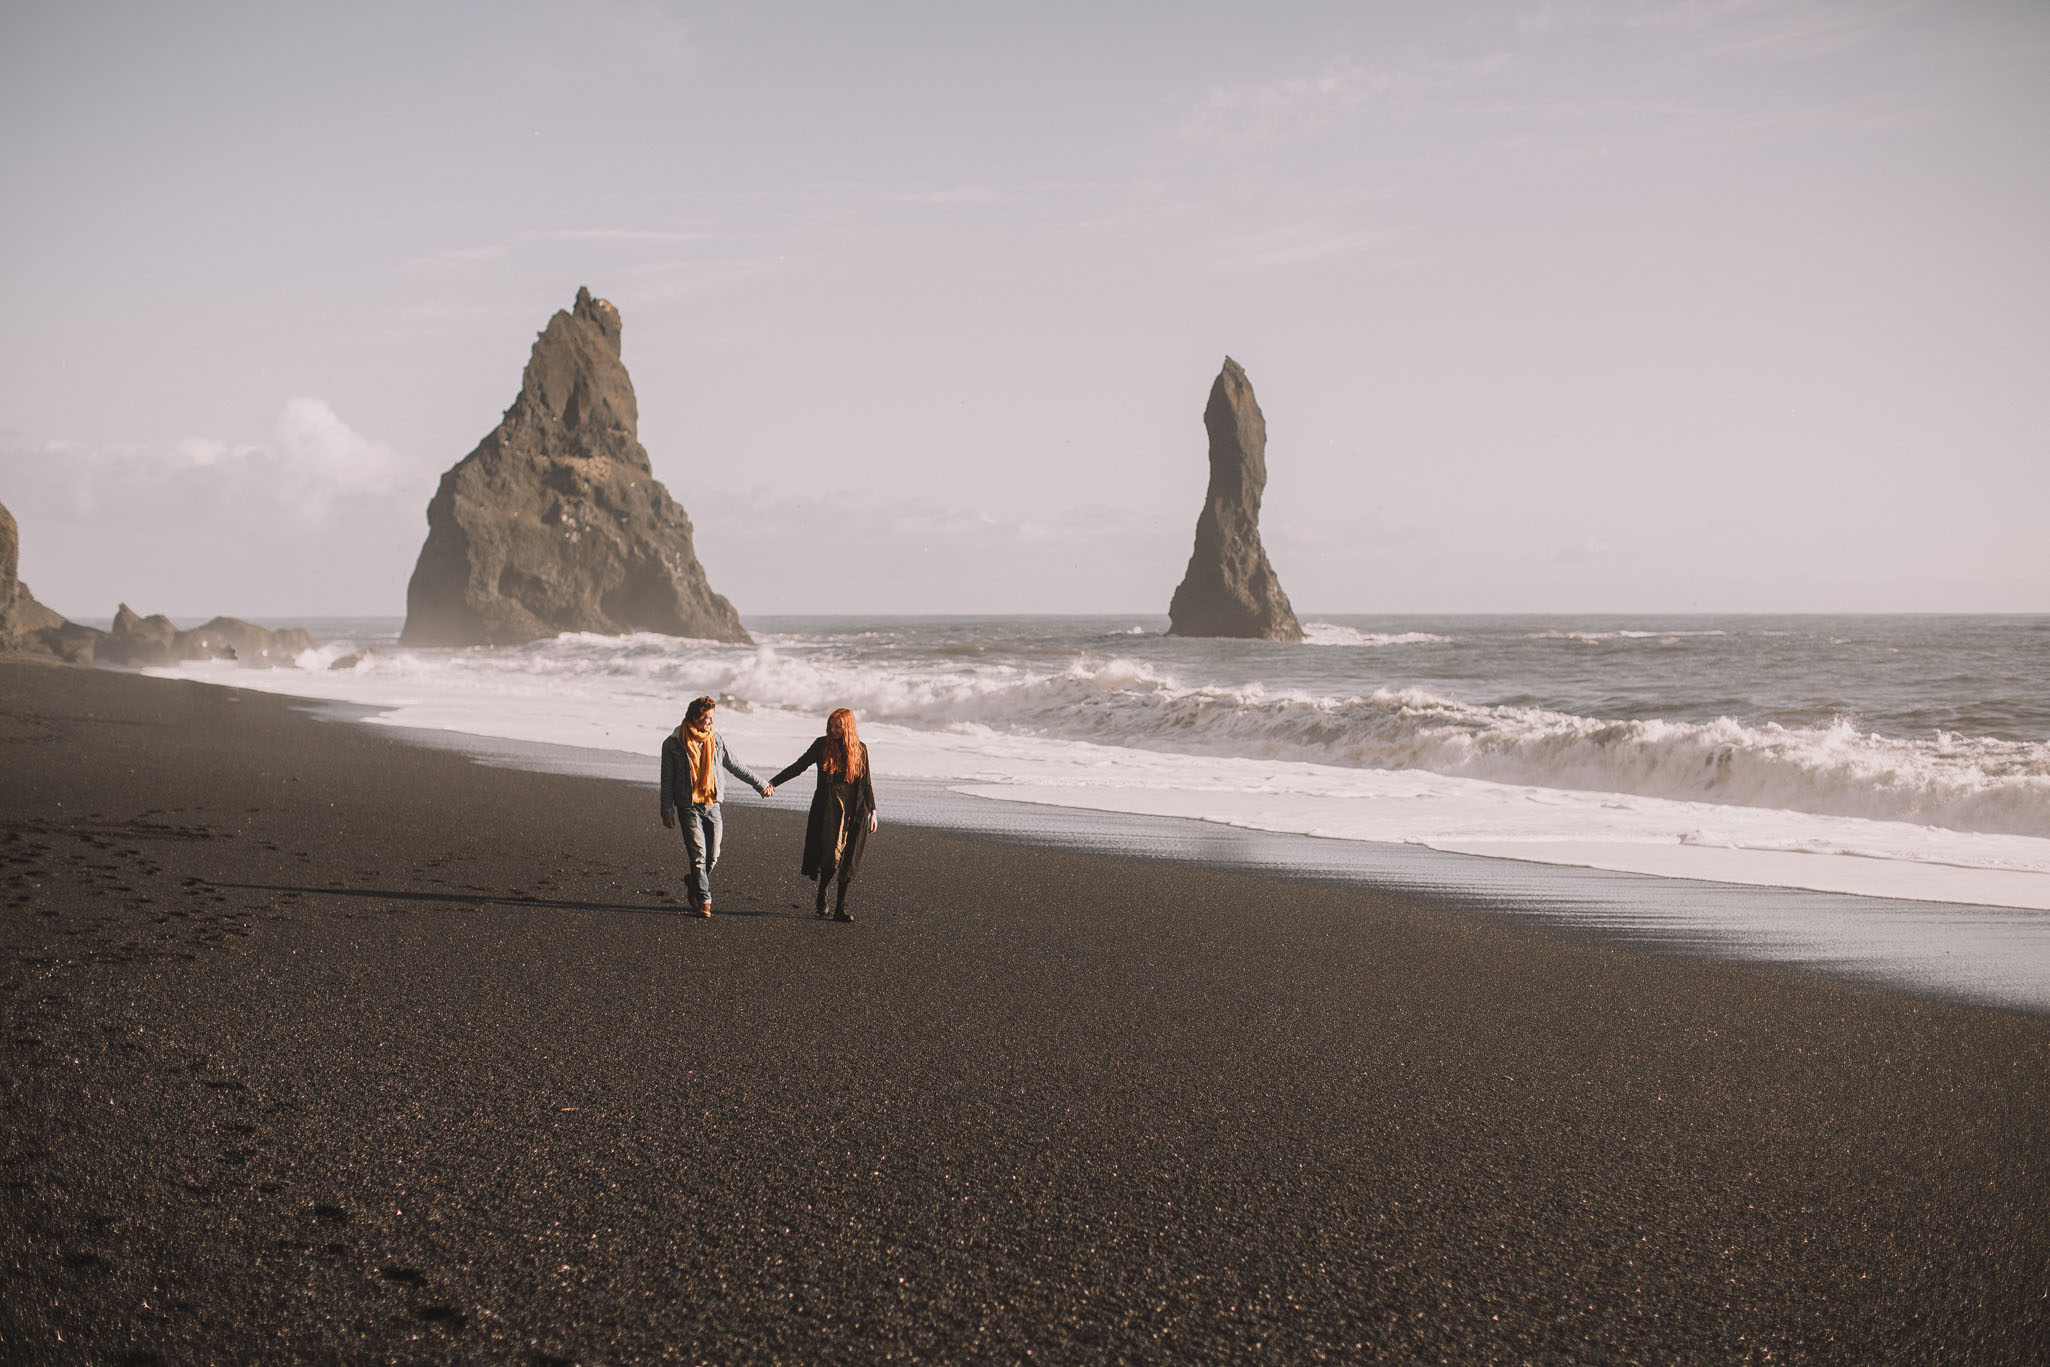 Road-trip-Islande-Iceland-Voyage-Travel-Portrait-Jérémy-Boyer-Sunny-day-Vik-black-sand-beach-sable-noir-Reynifjara-14.jpg